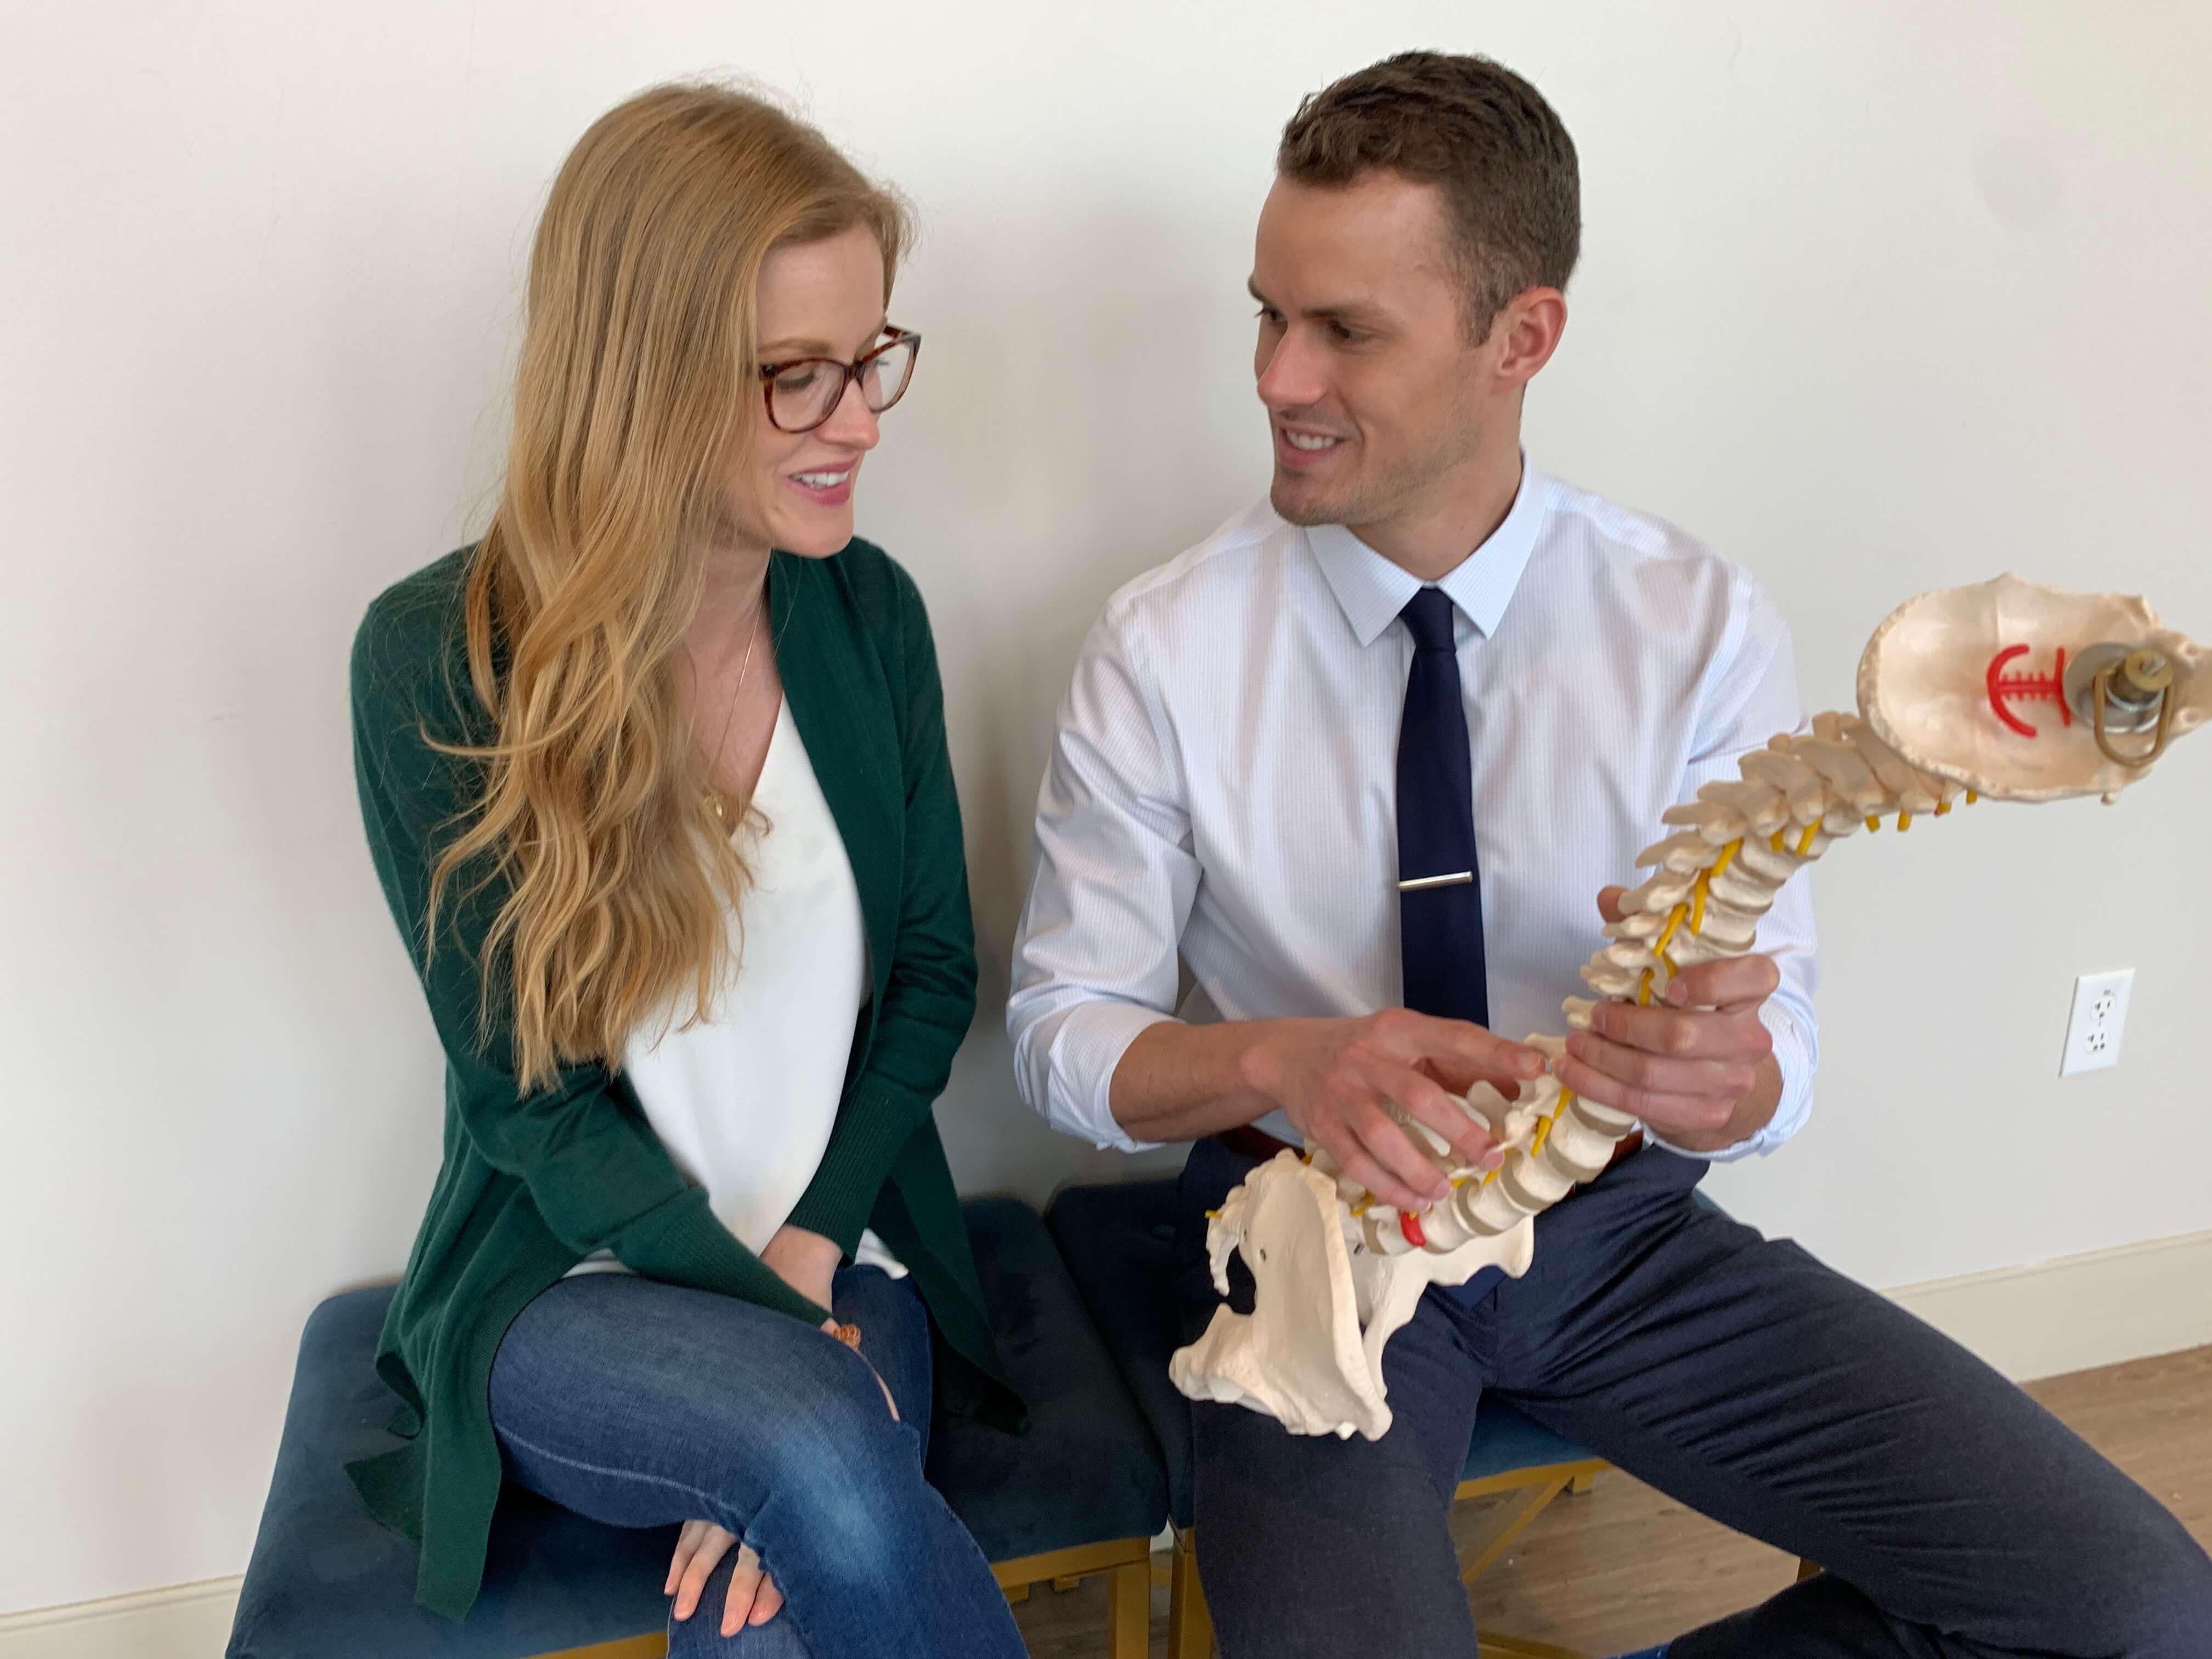 Core Chiropractic, Prairieville and Baton Rouge Clinics